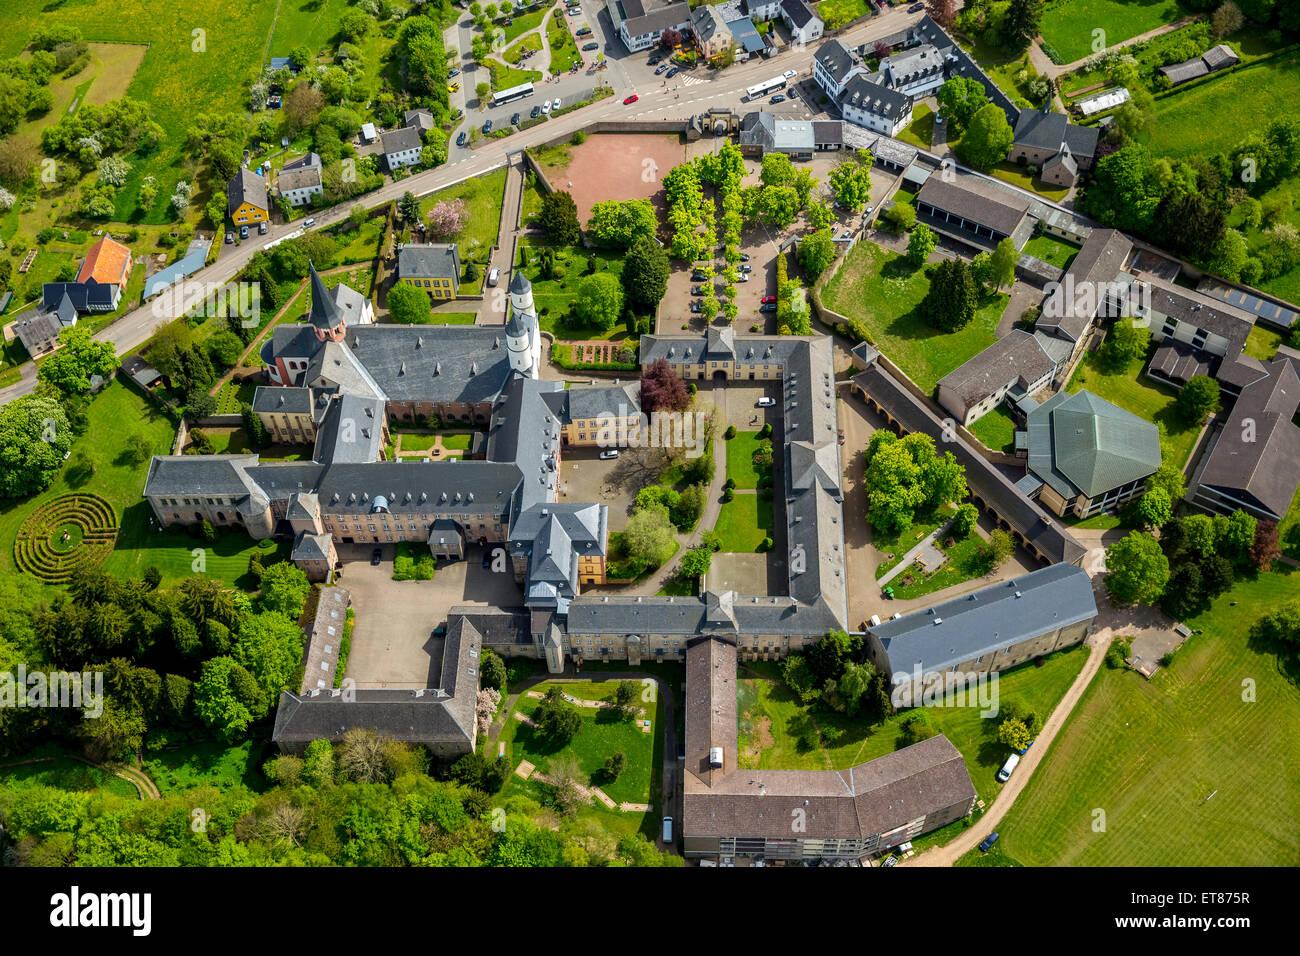 Kloster Steinfeld, Benediktiner Abtei, Kall, Eifel